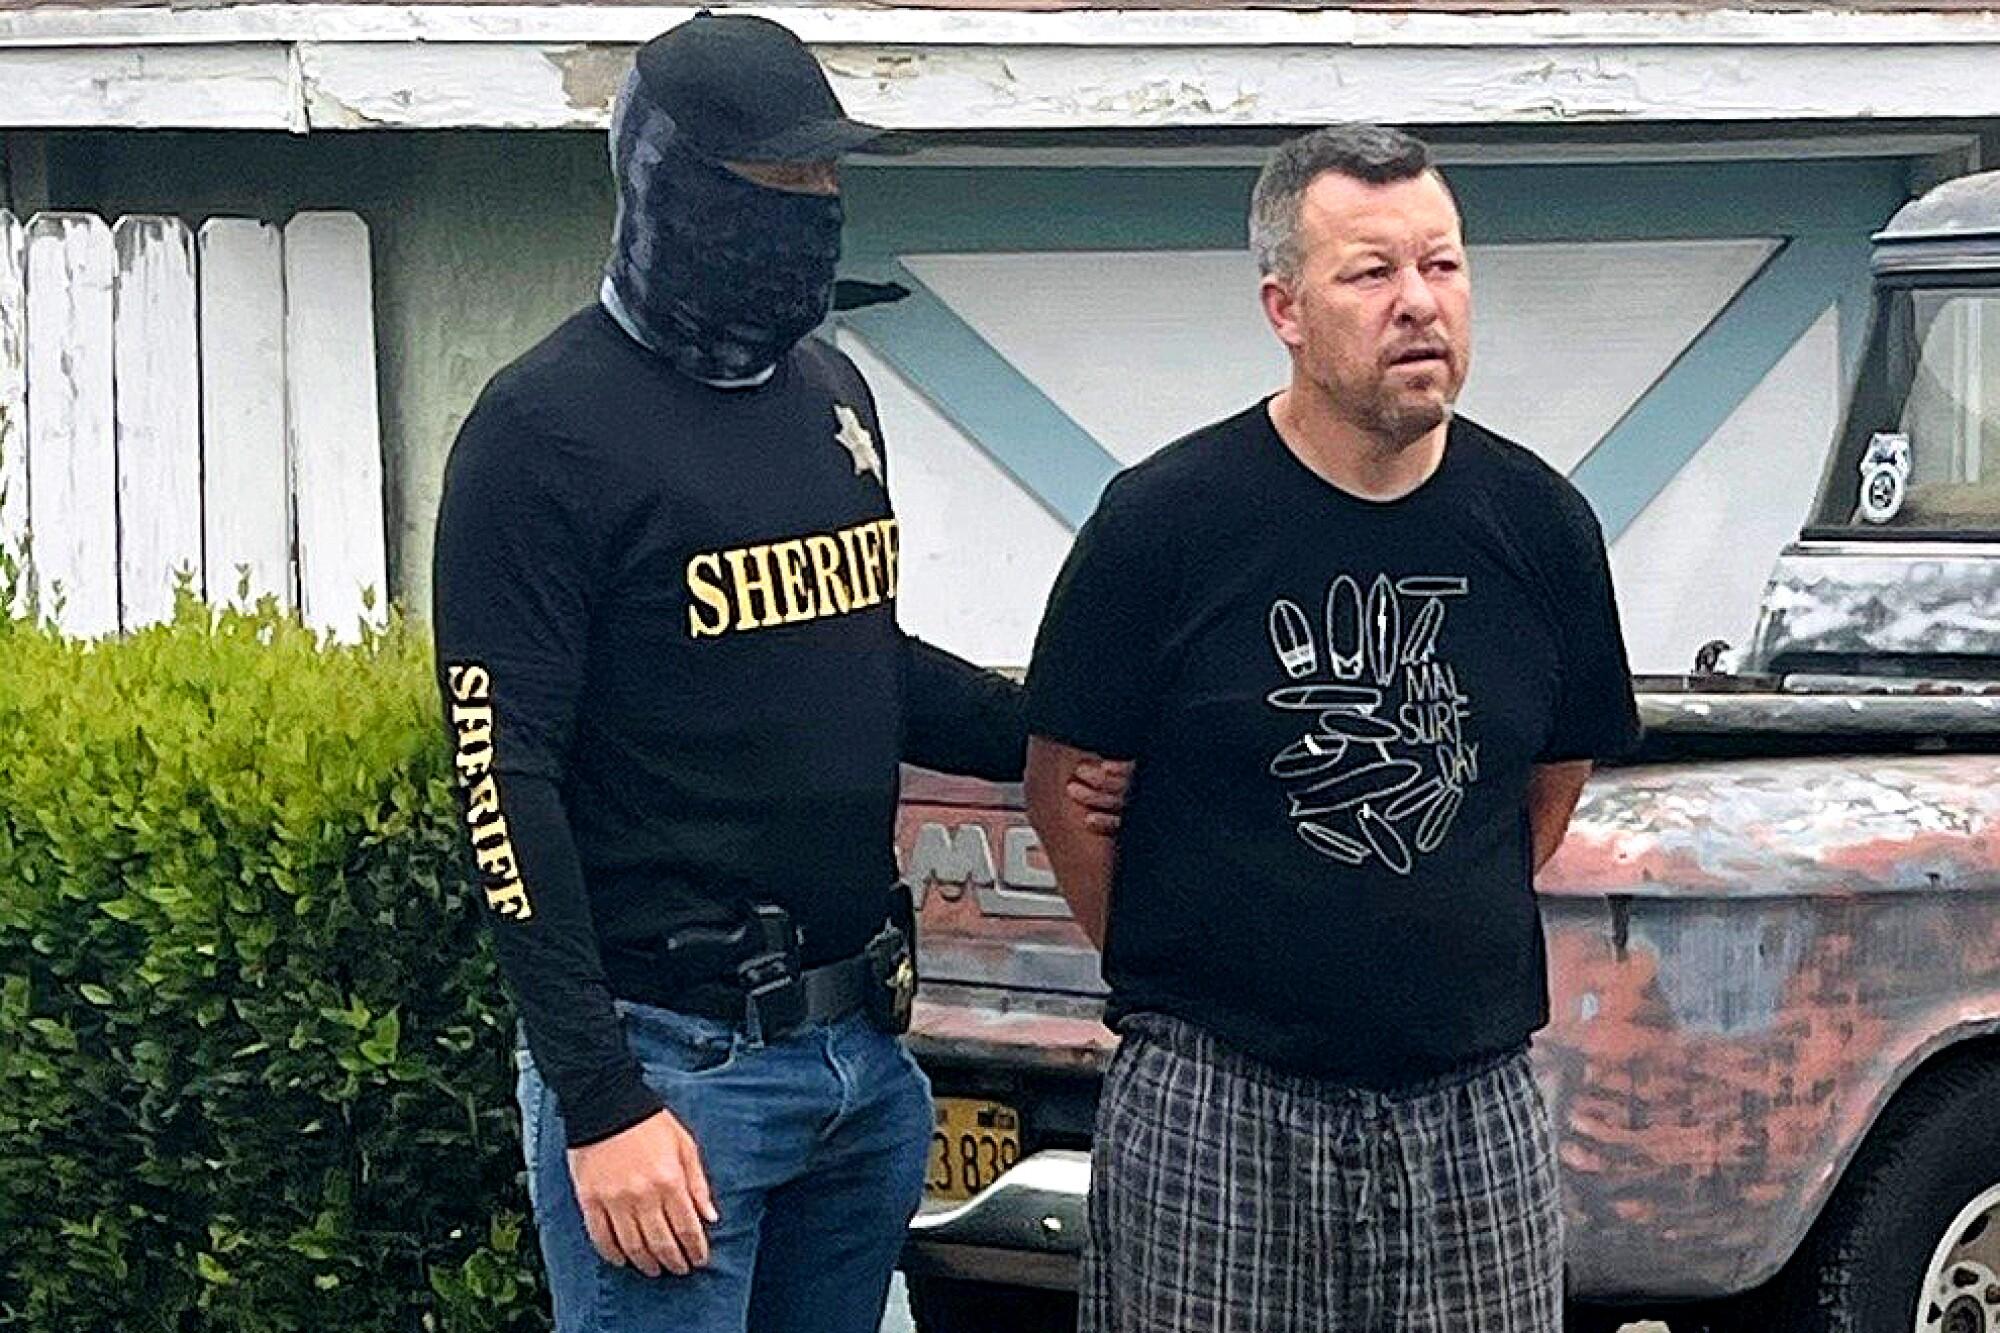 Paul Flores is arrested